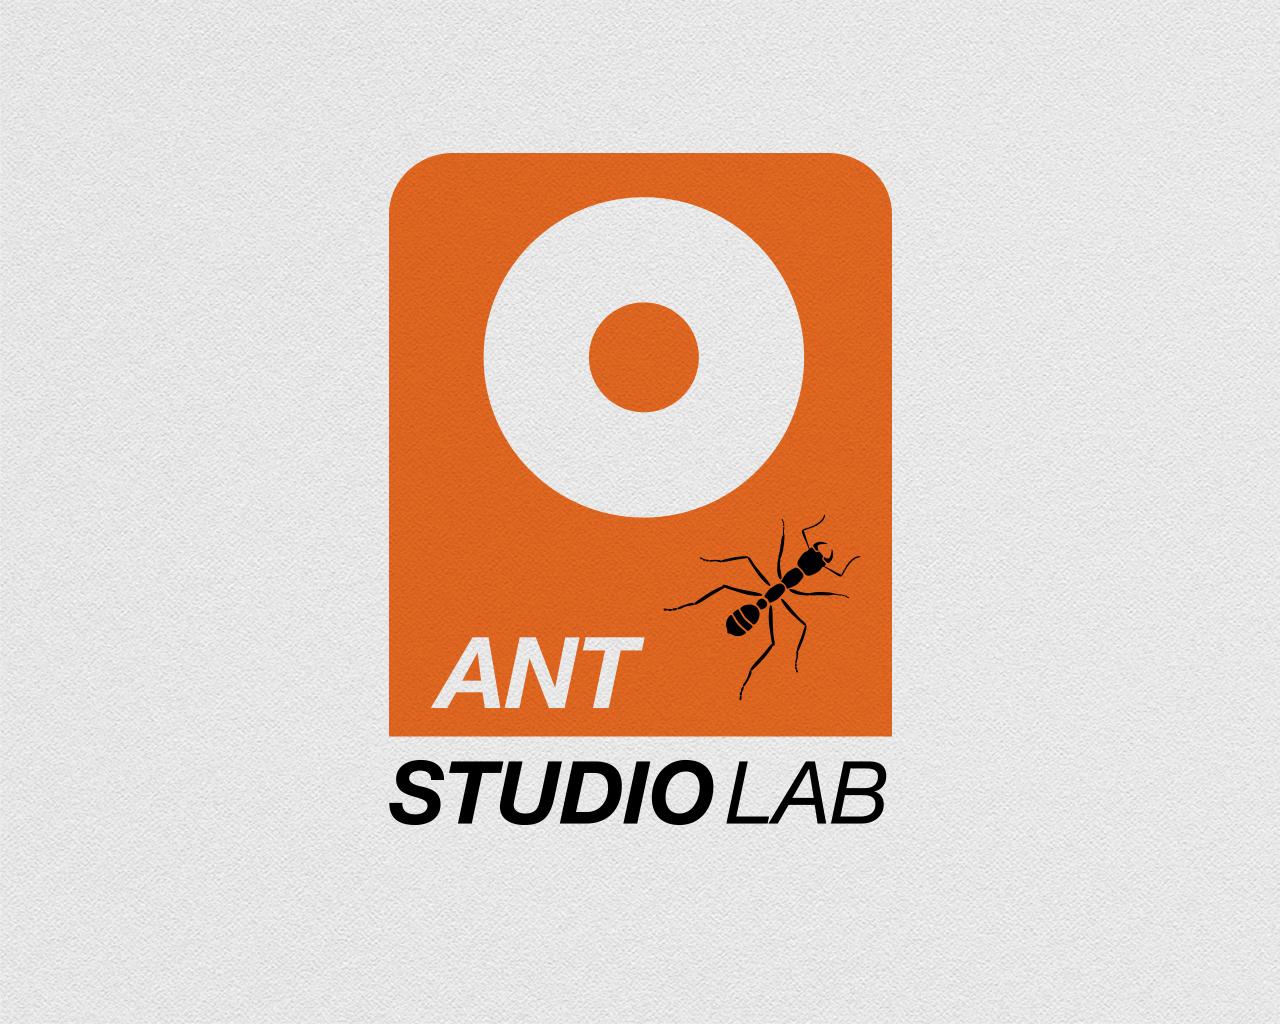 Logo-antstudiolab